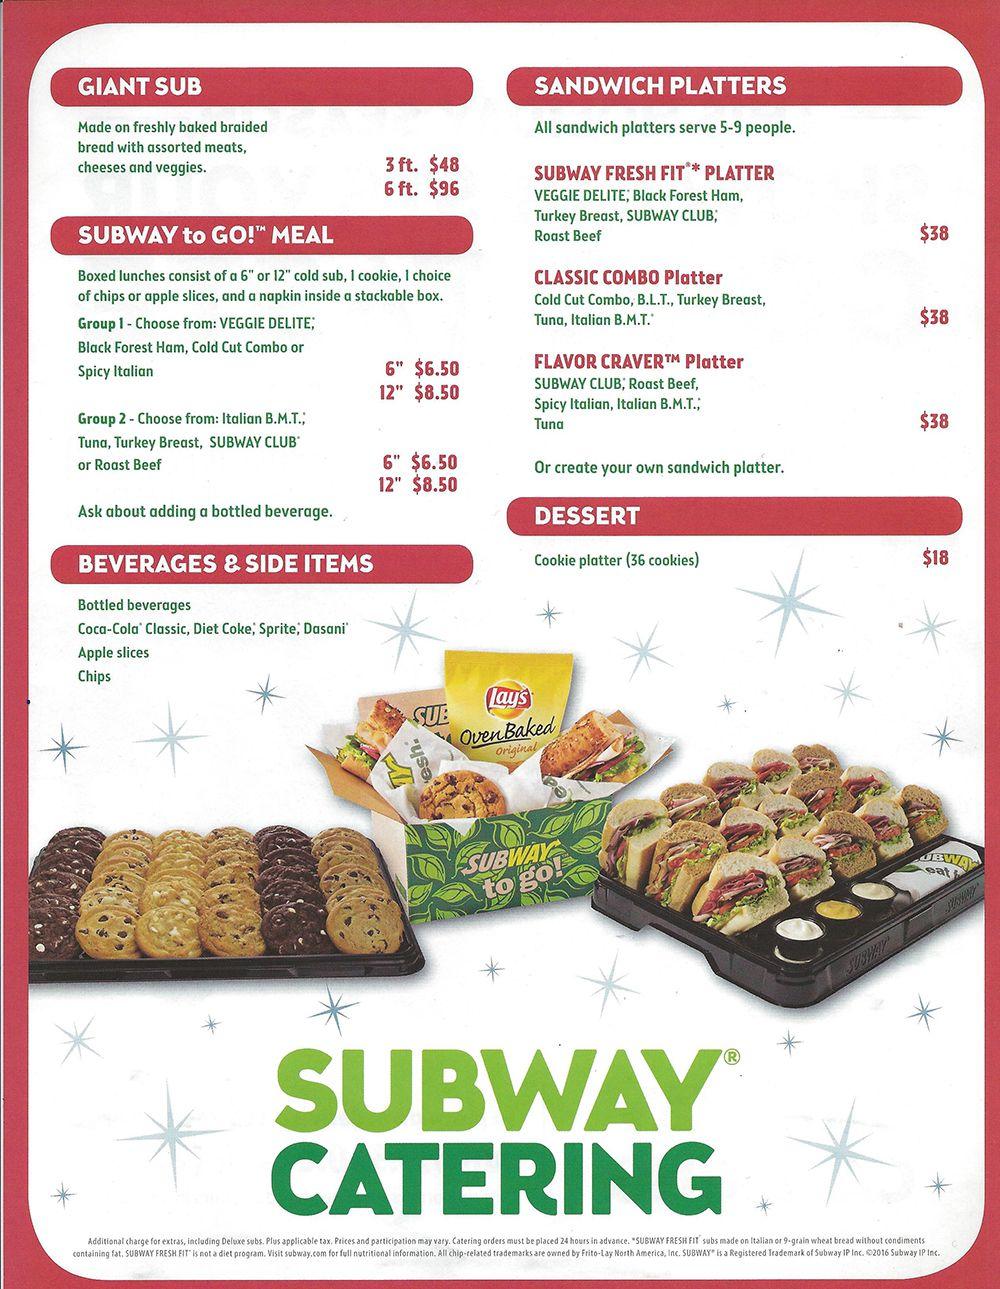 Subway 711 Canal Street Stamford Ct 06902 Subway 1126 E Main Street Stamford Ct 06902 Subway 946 Hope Street St Sandwich Platter Sub Sandwiches Braided Bread